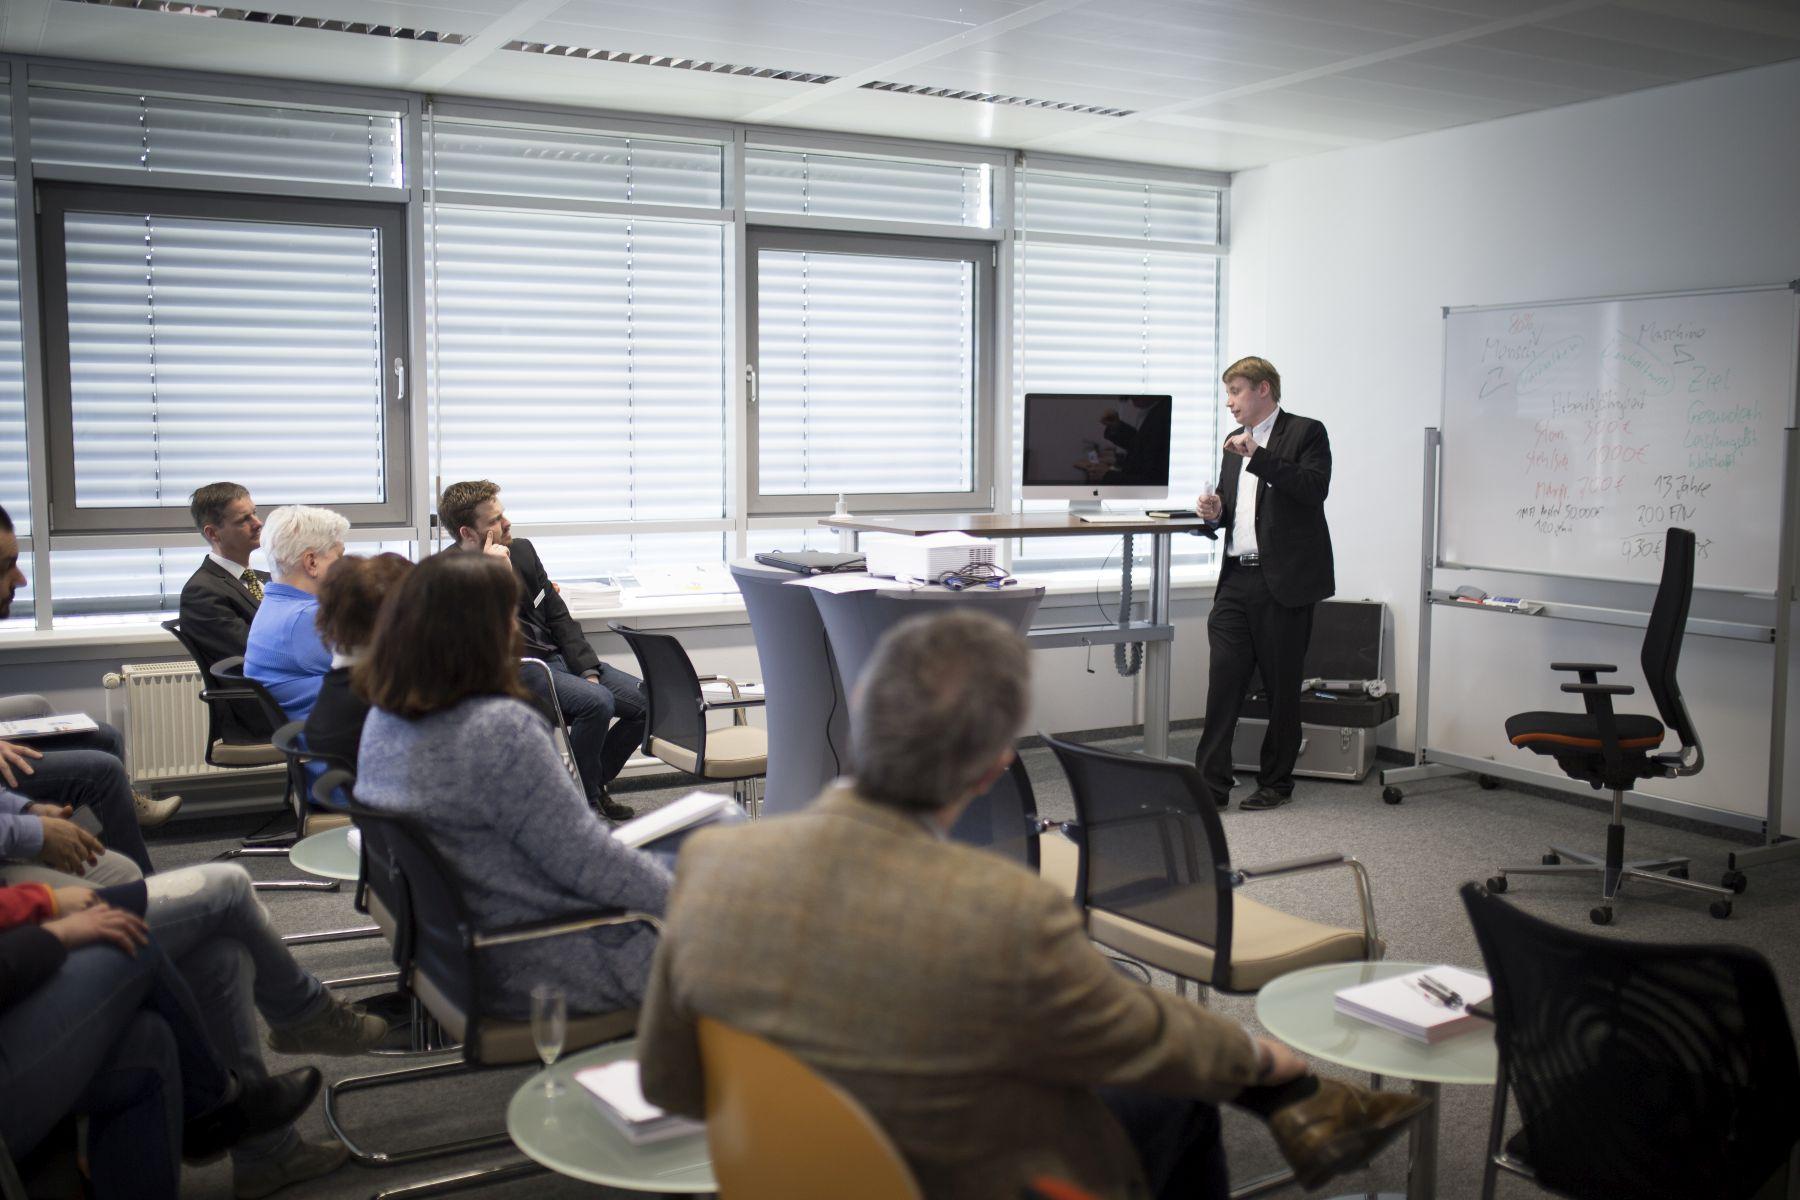 Rückblick: Ergonomie in 5 Punkten - Infoveranstaltung bei Büromöbel-Experte 28